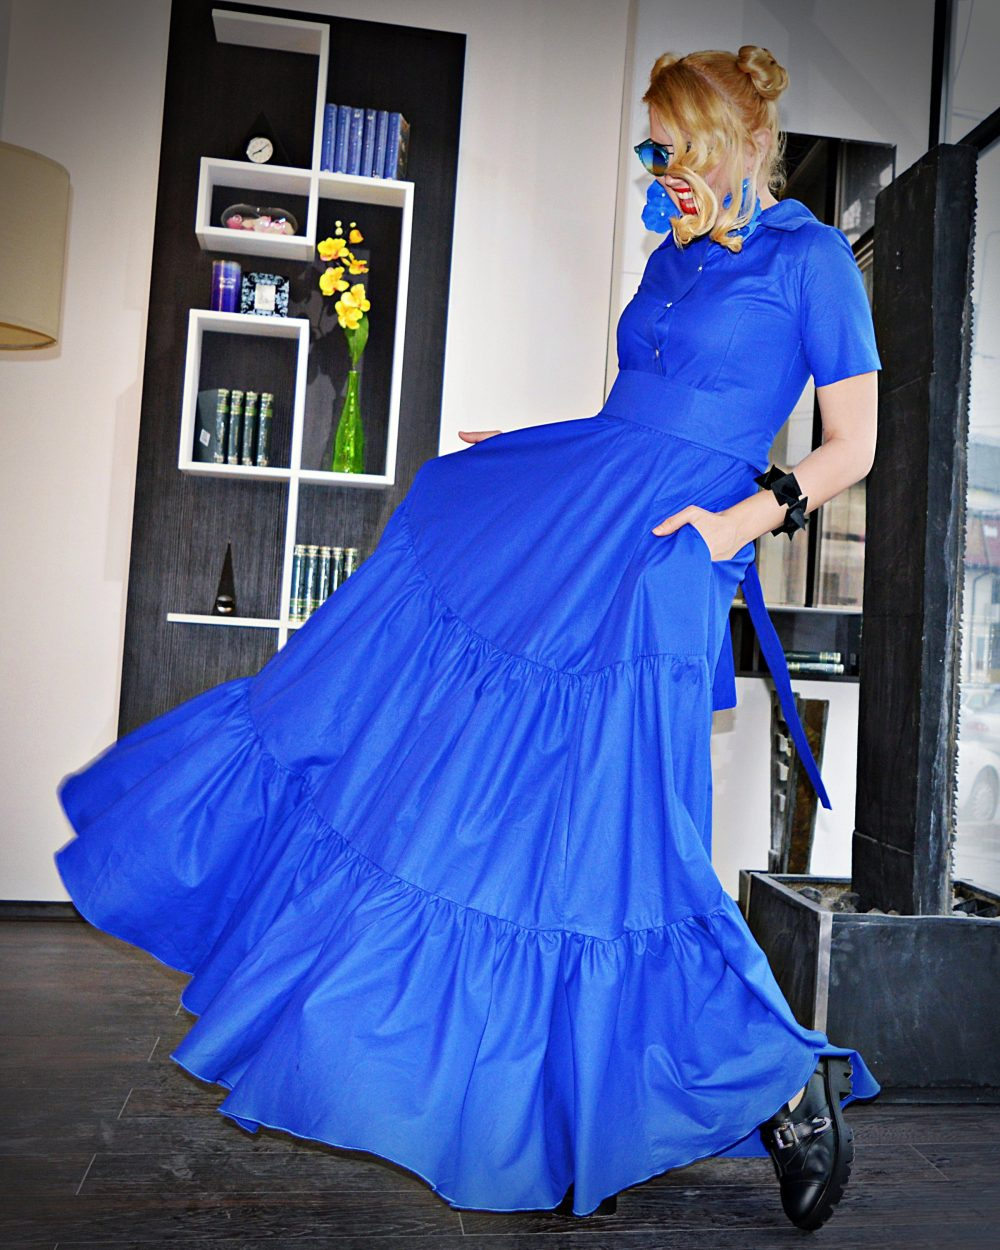 Shirt Dress For Women Summer Maxi With Pockets Formal Party Rockabilly Cotton Pin Up A-Line Flounces Tdk340